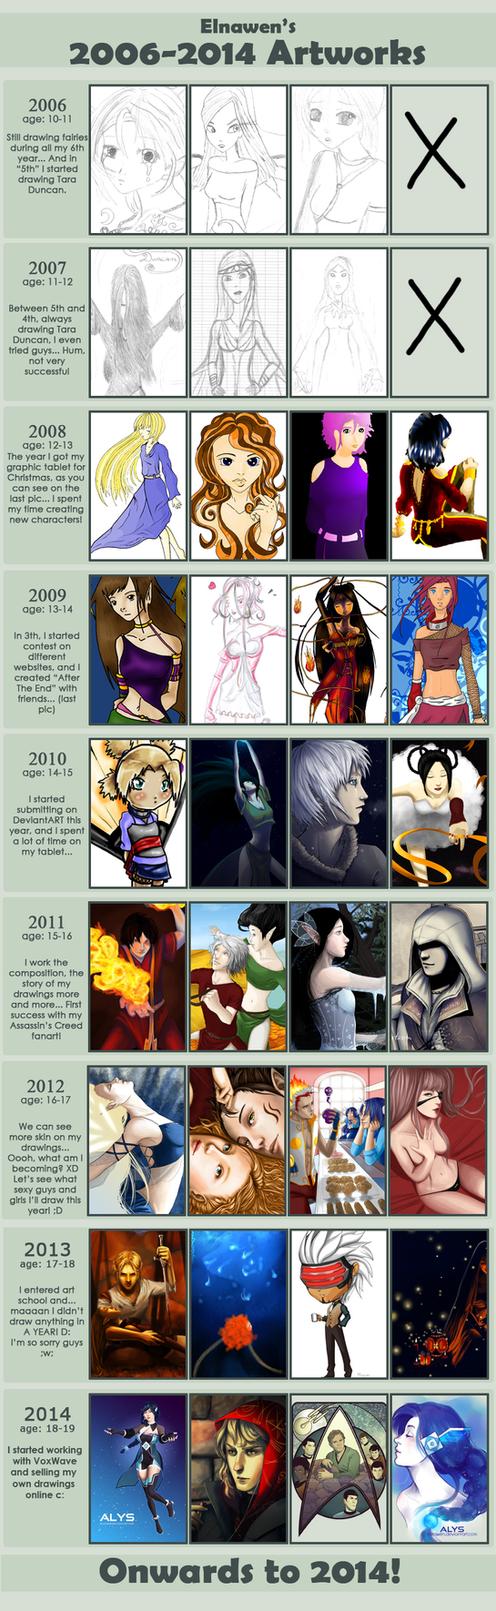 Improvement Meme 2006-2014 by Elnawen